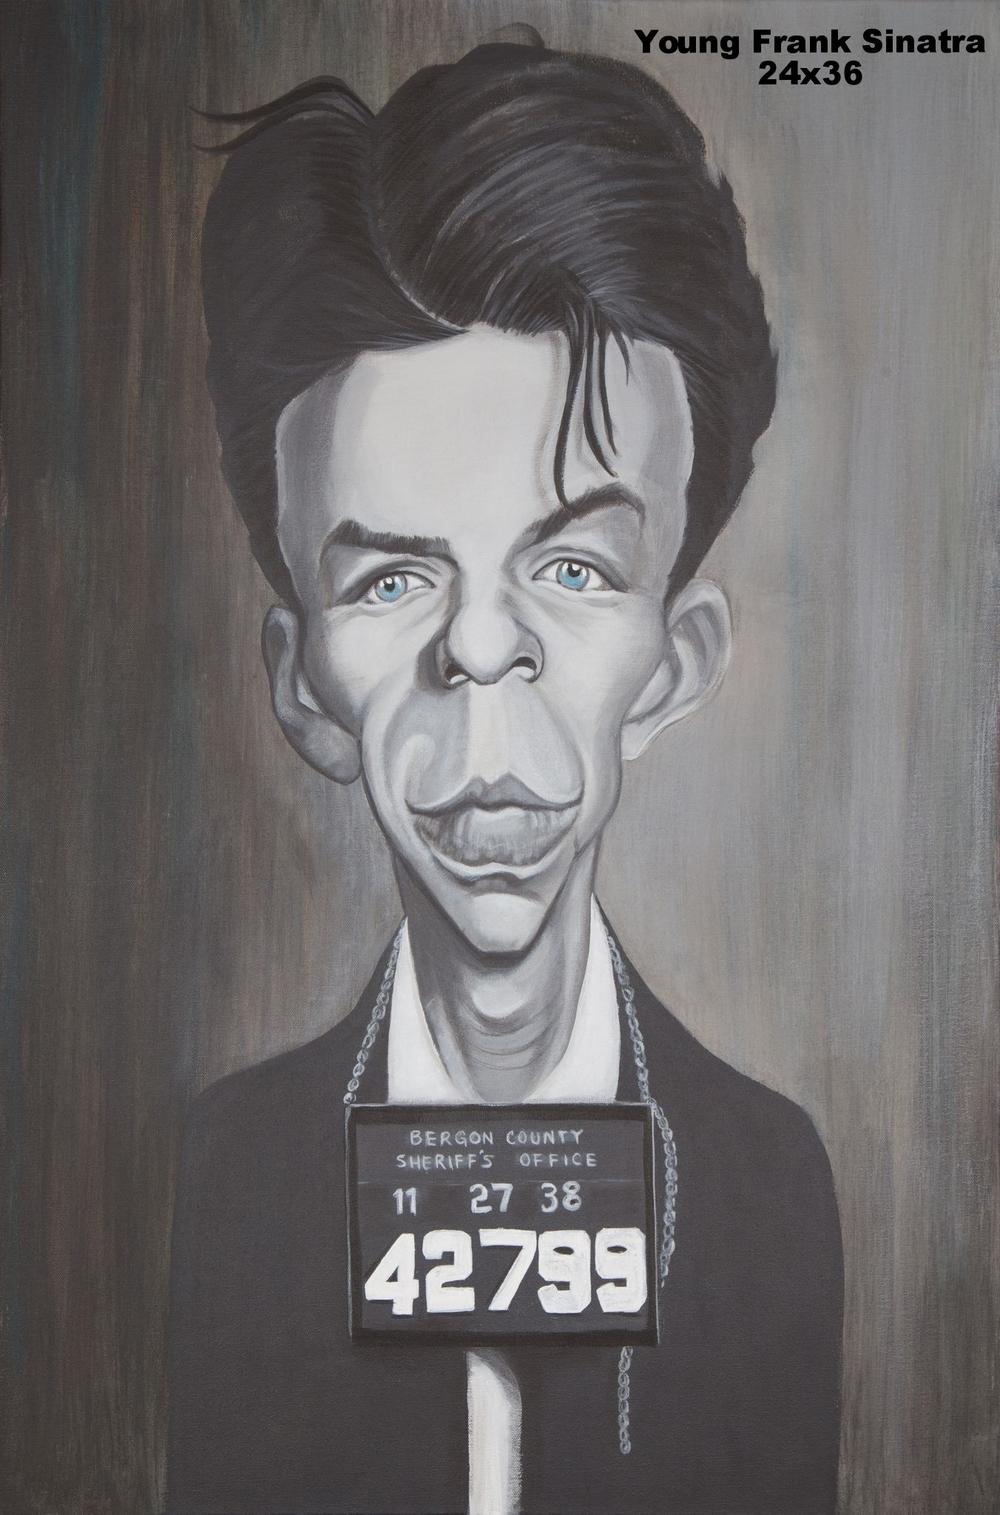 Frank Sinatra 24 x 36.jpeg